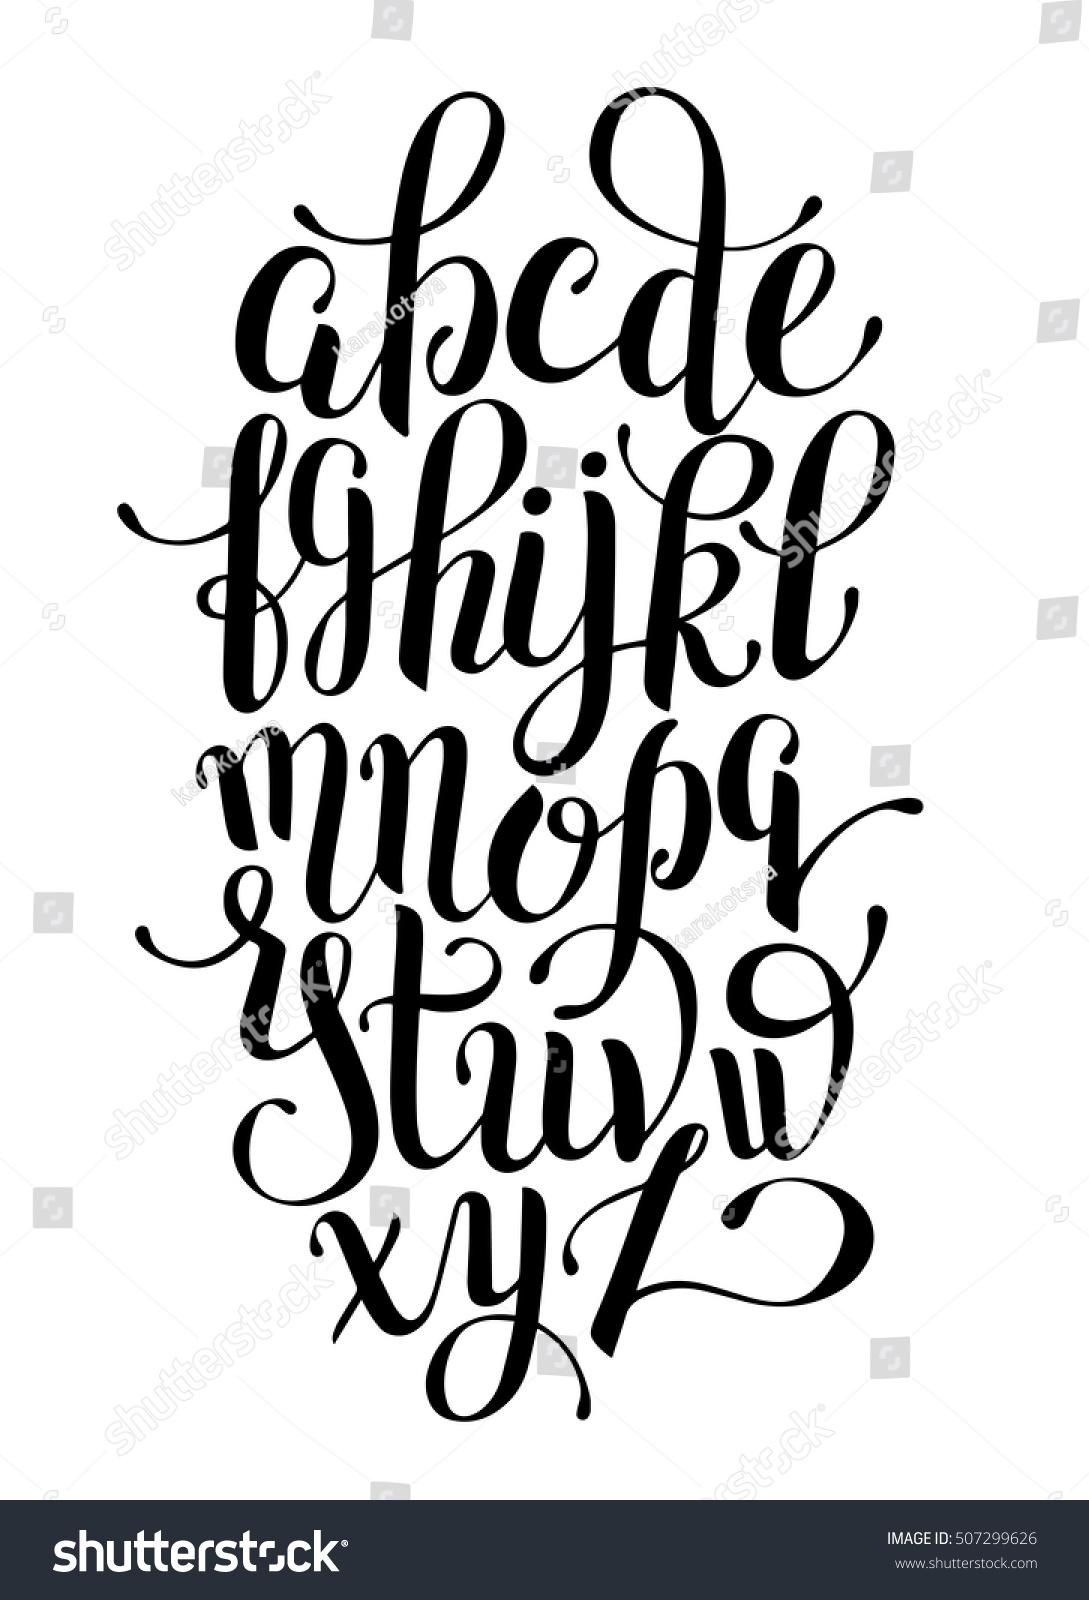 Black And White Hand Lettering Alphabet Design Handwritten Brush Script Modern Calligraphy Cursive Font Vector